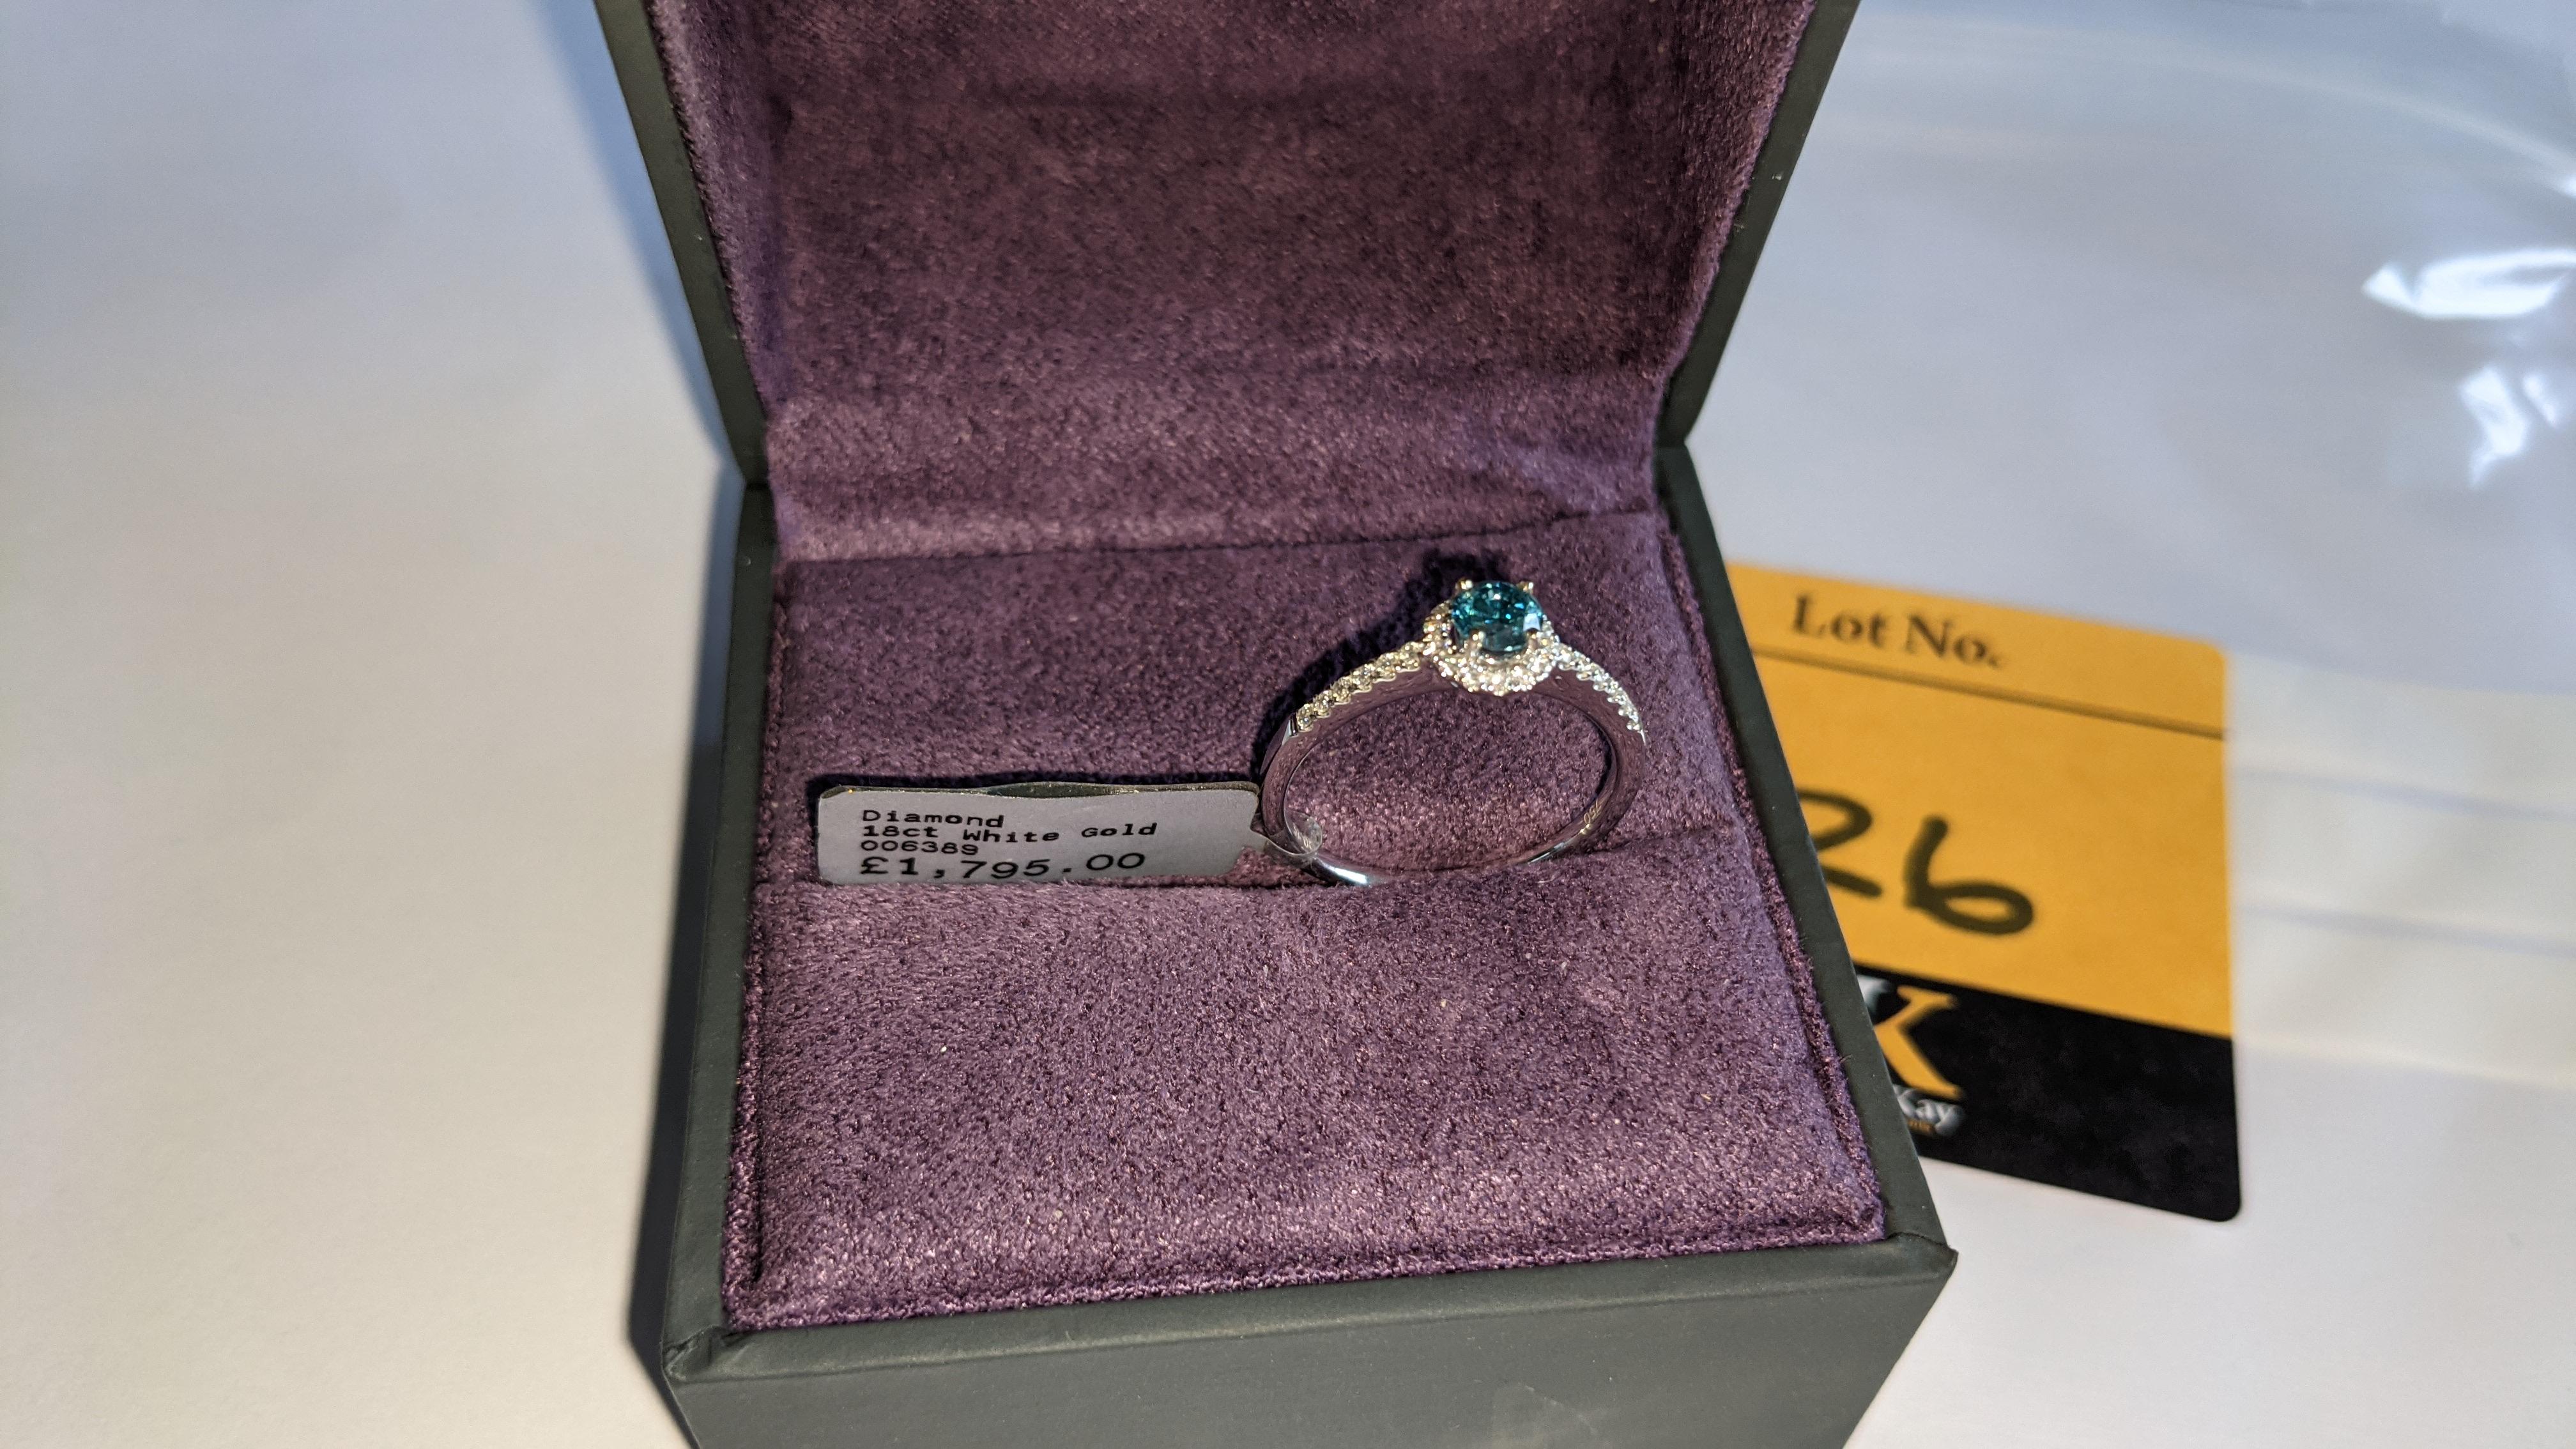 18ct white gold & diamond ring with 0.30ct blue diamond & 0.1ct of additional diamonds around the ce - Image 4 of 19